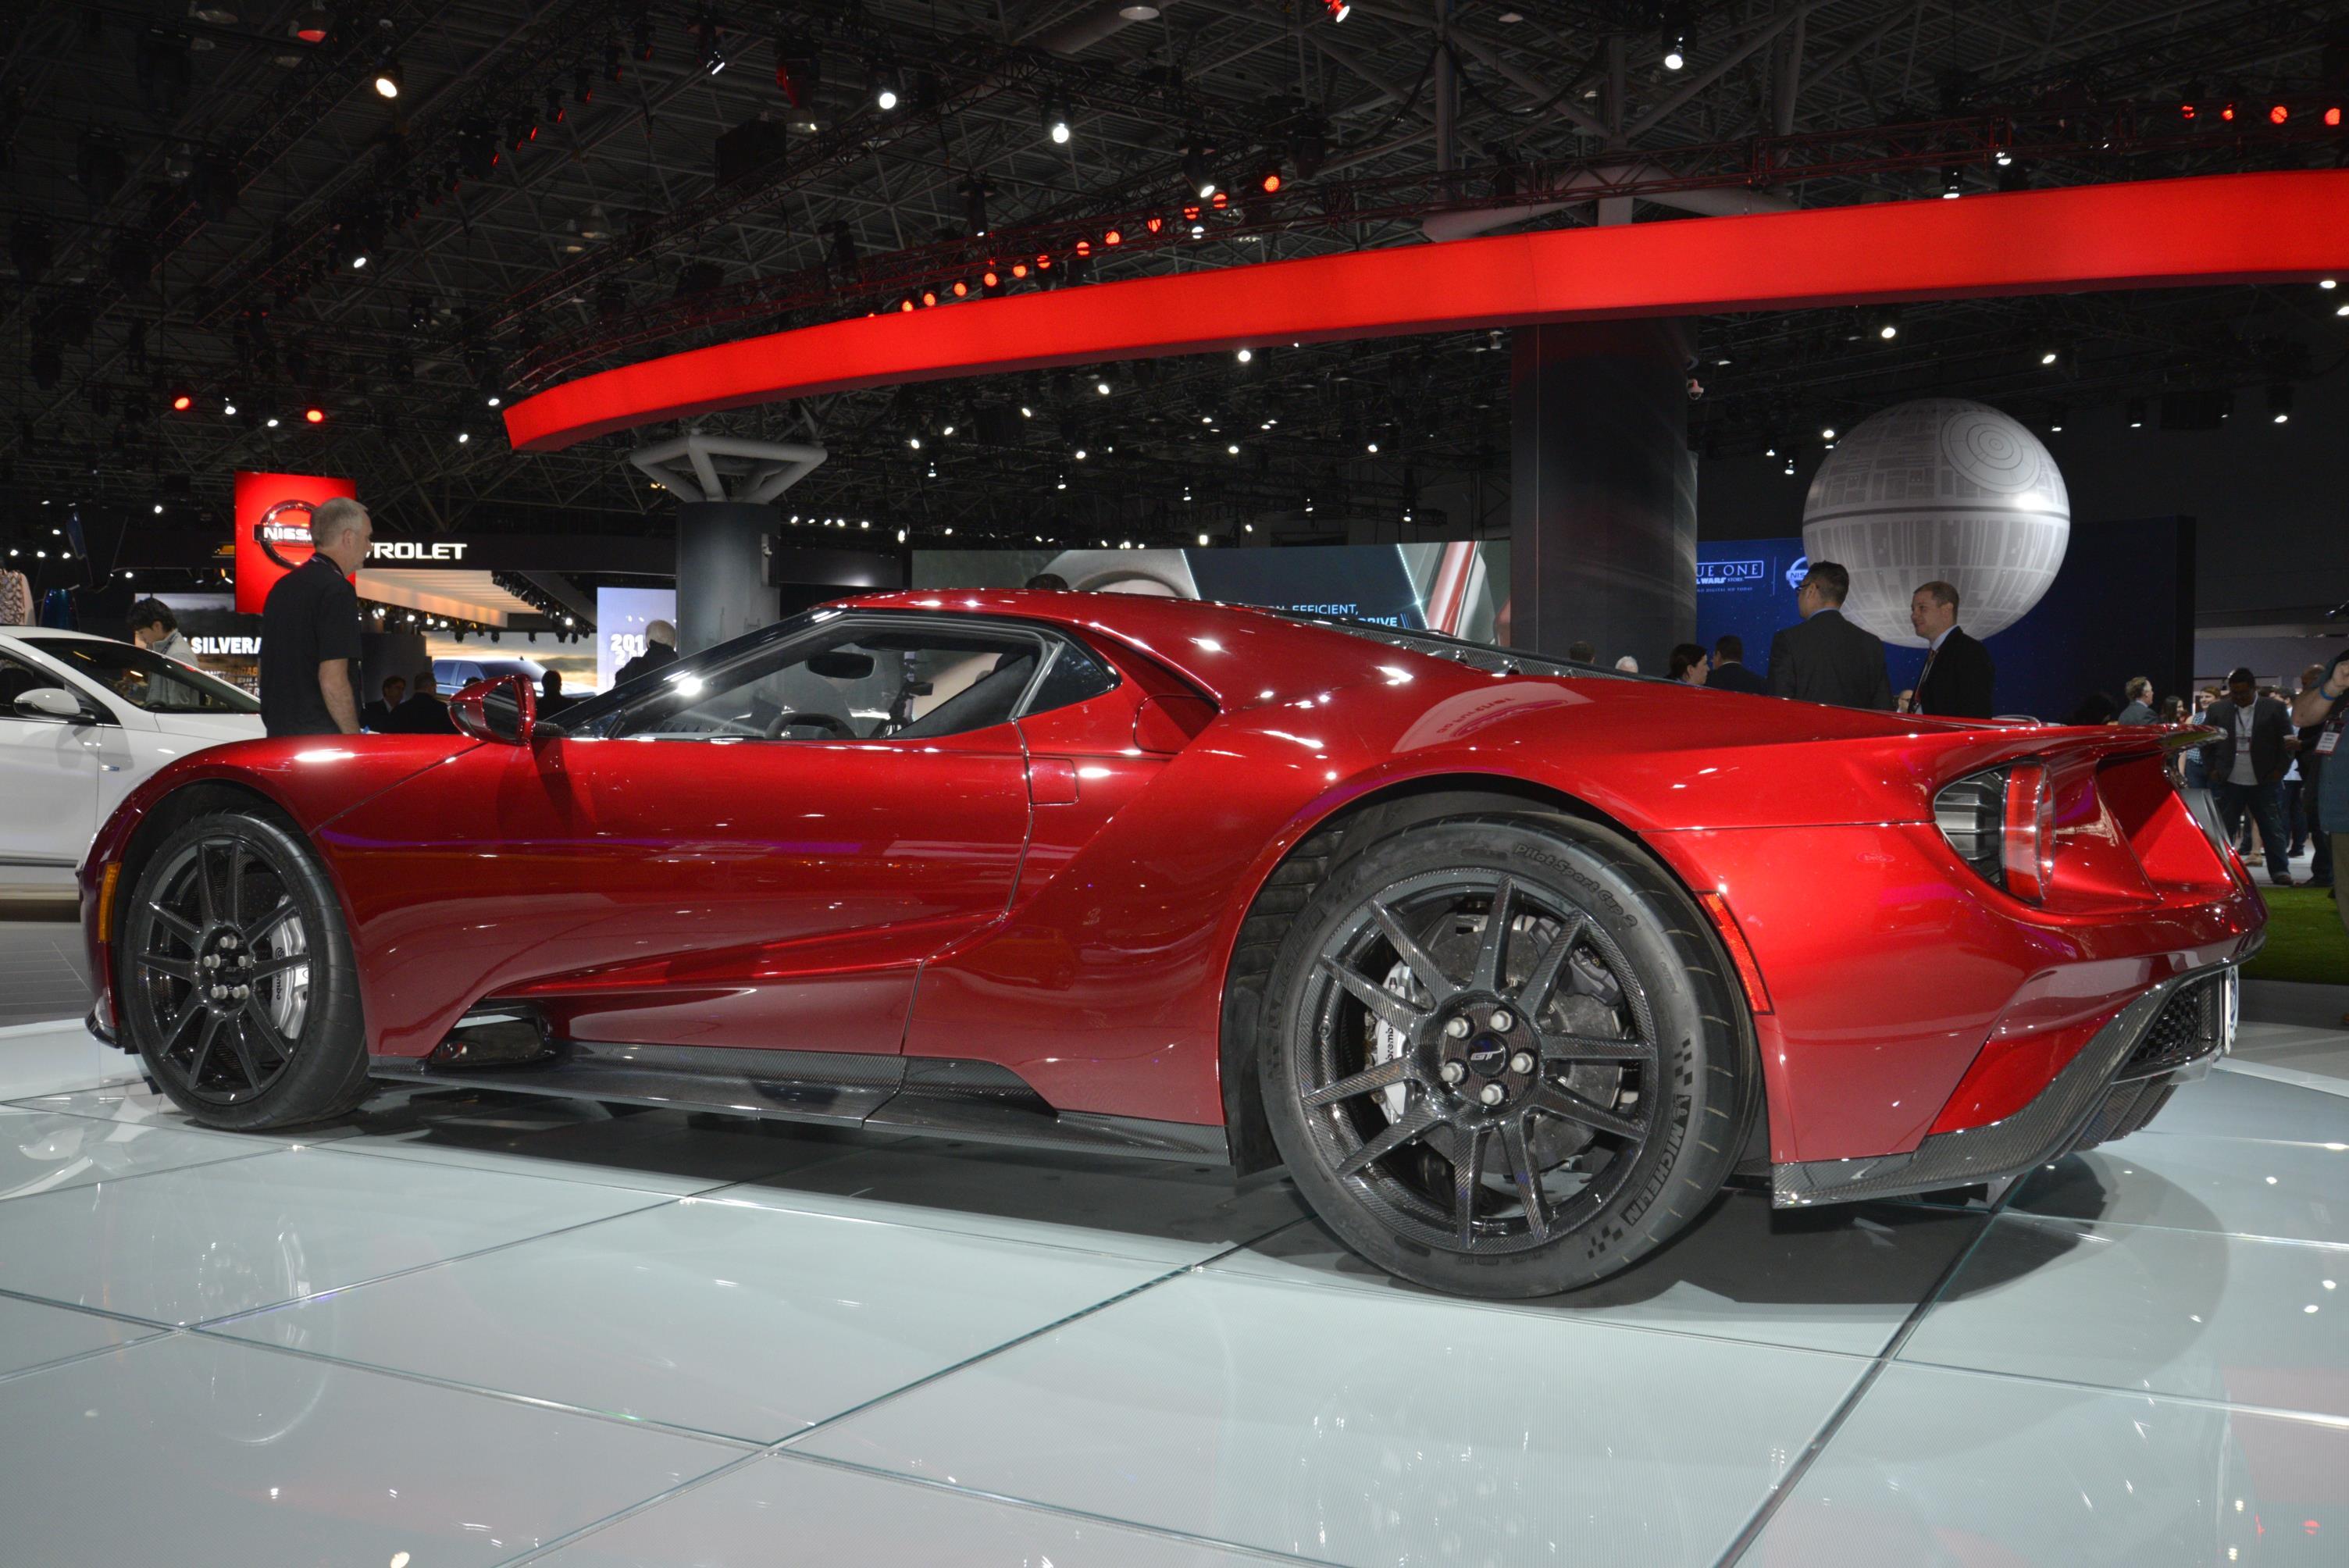 New York Auto Show 2017 (5)